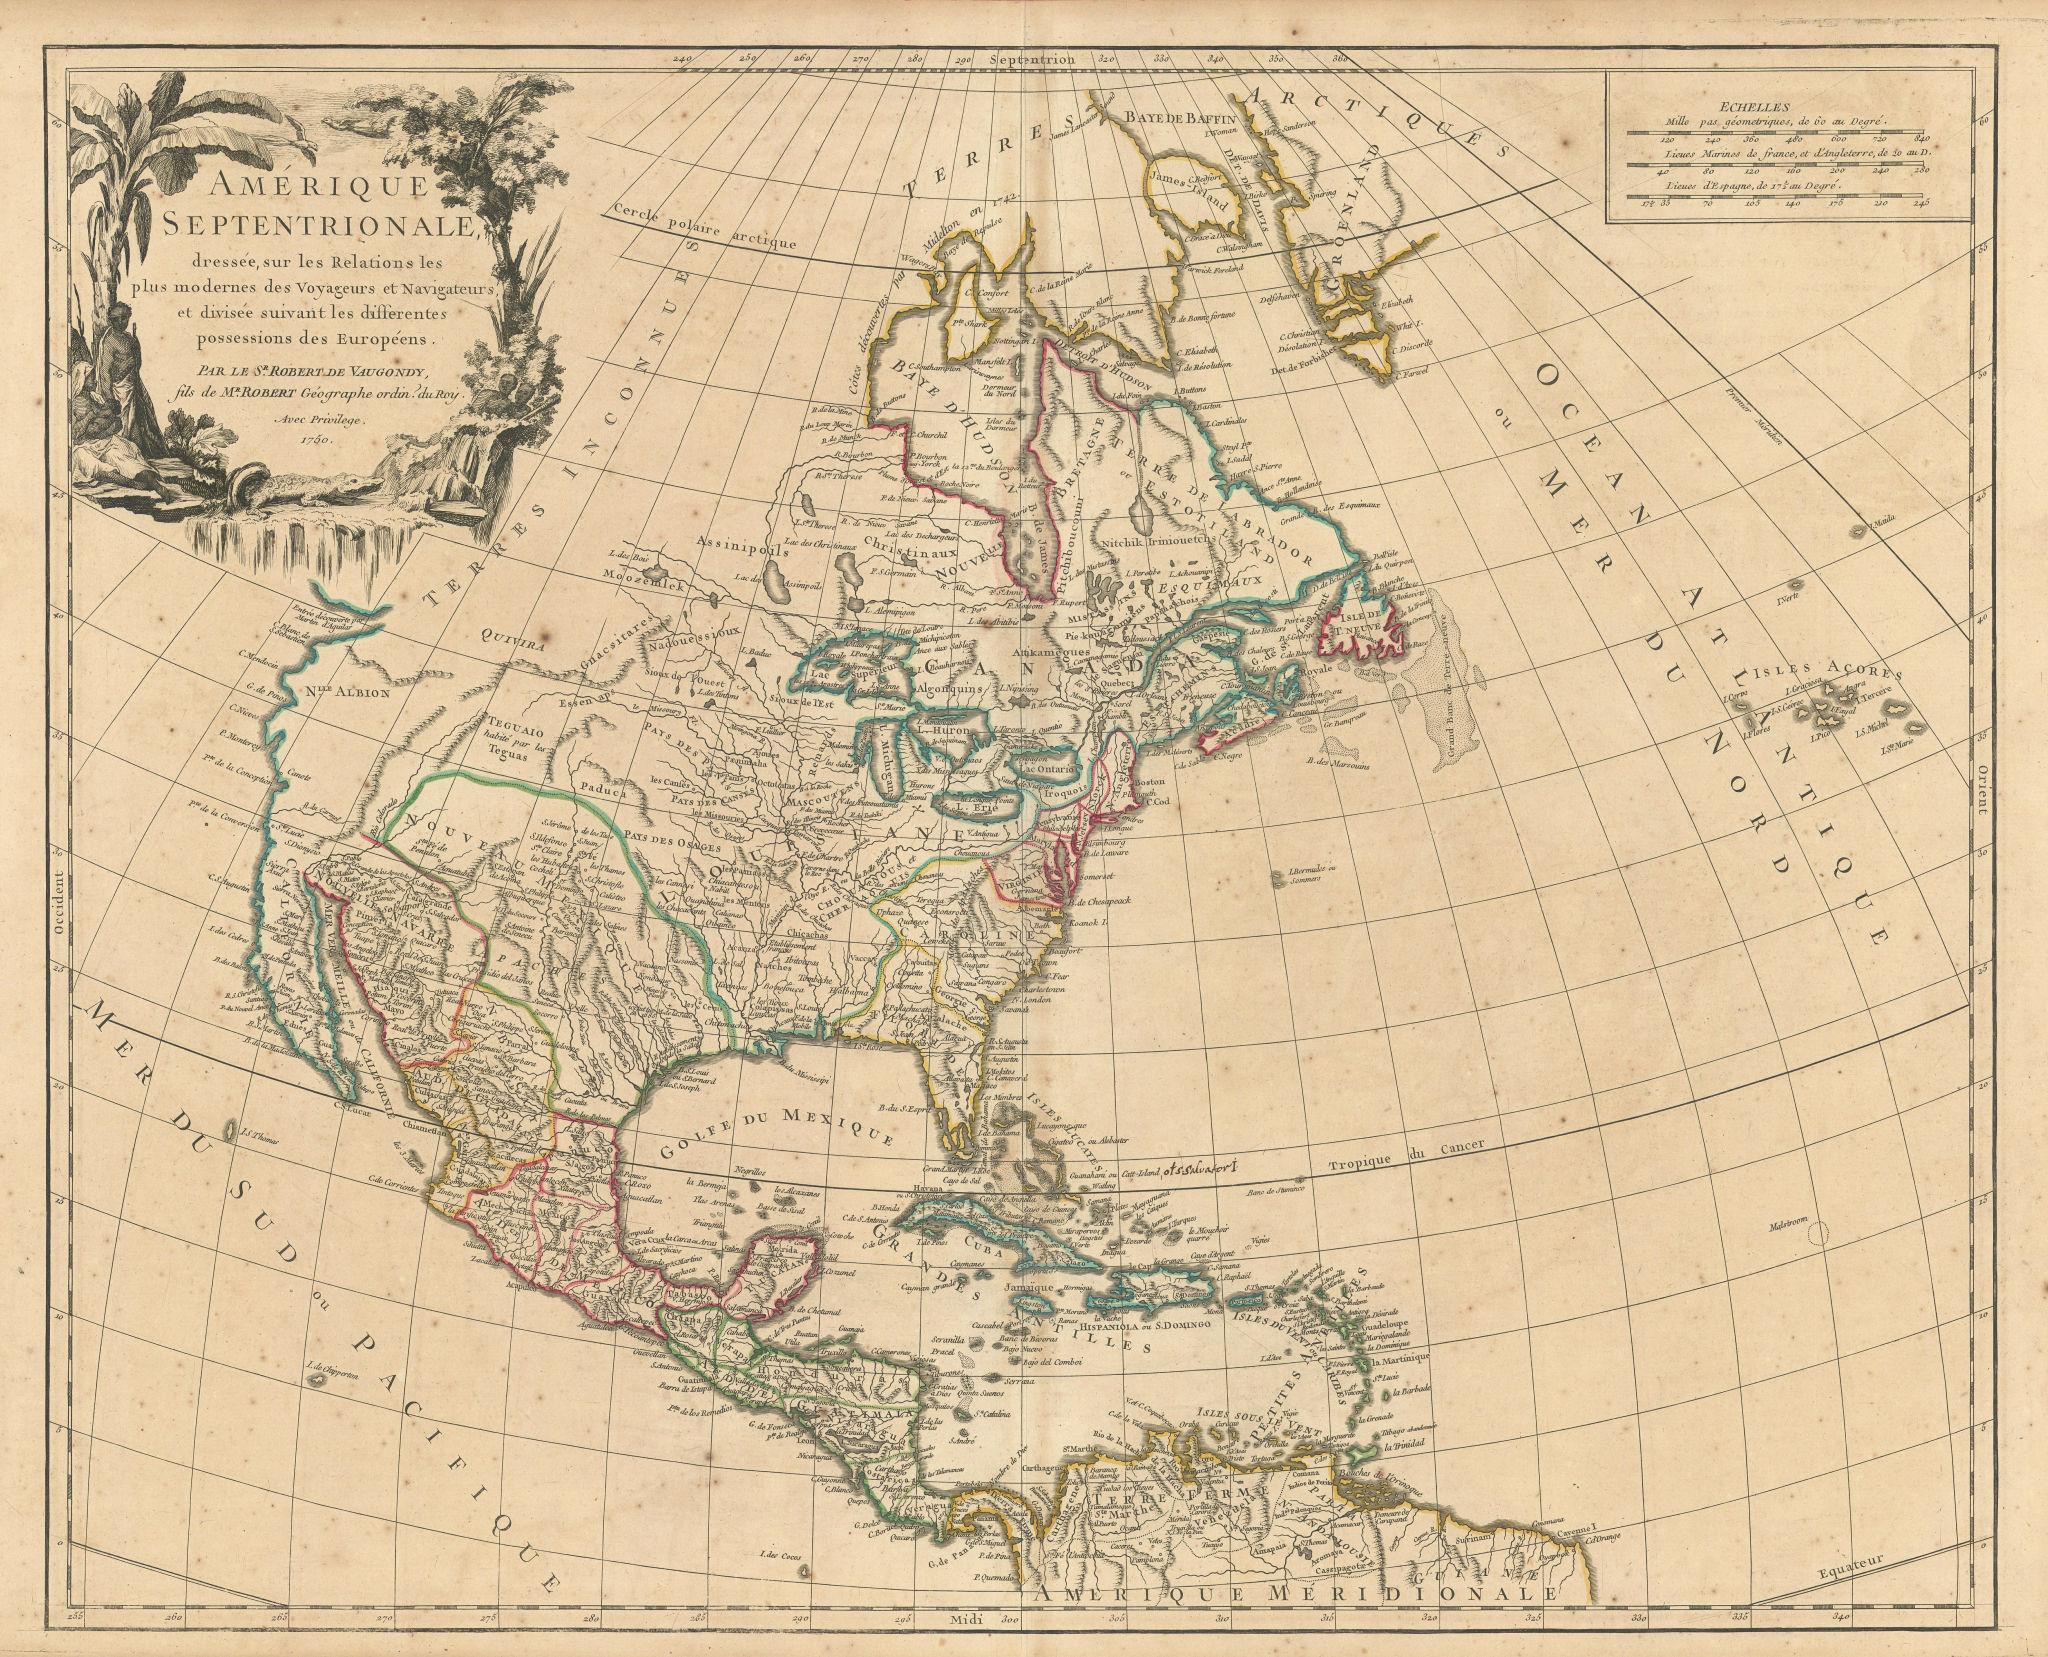 """Amérique Septentrionale"". North America United States Canada. VAUGONDY 1750 map"